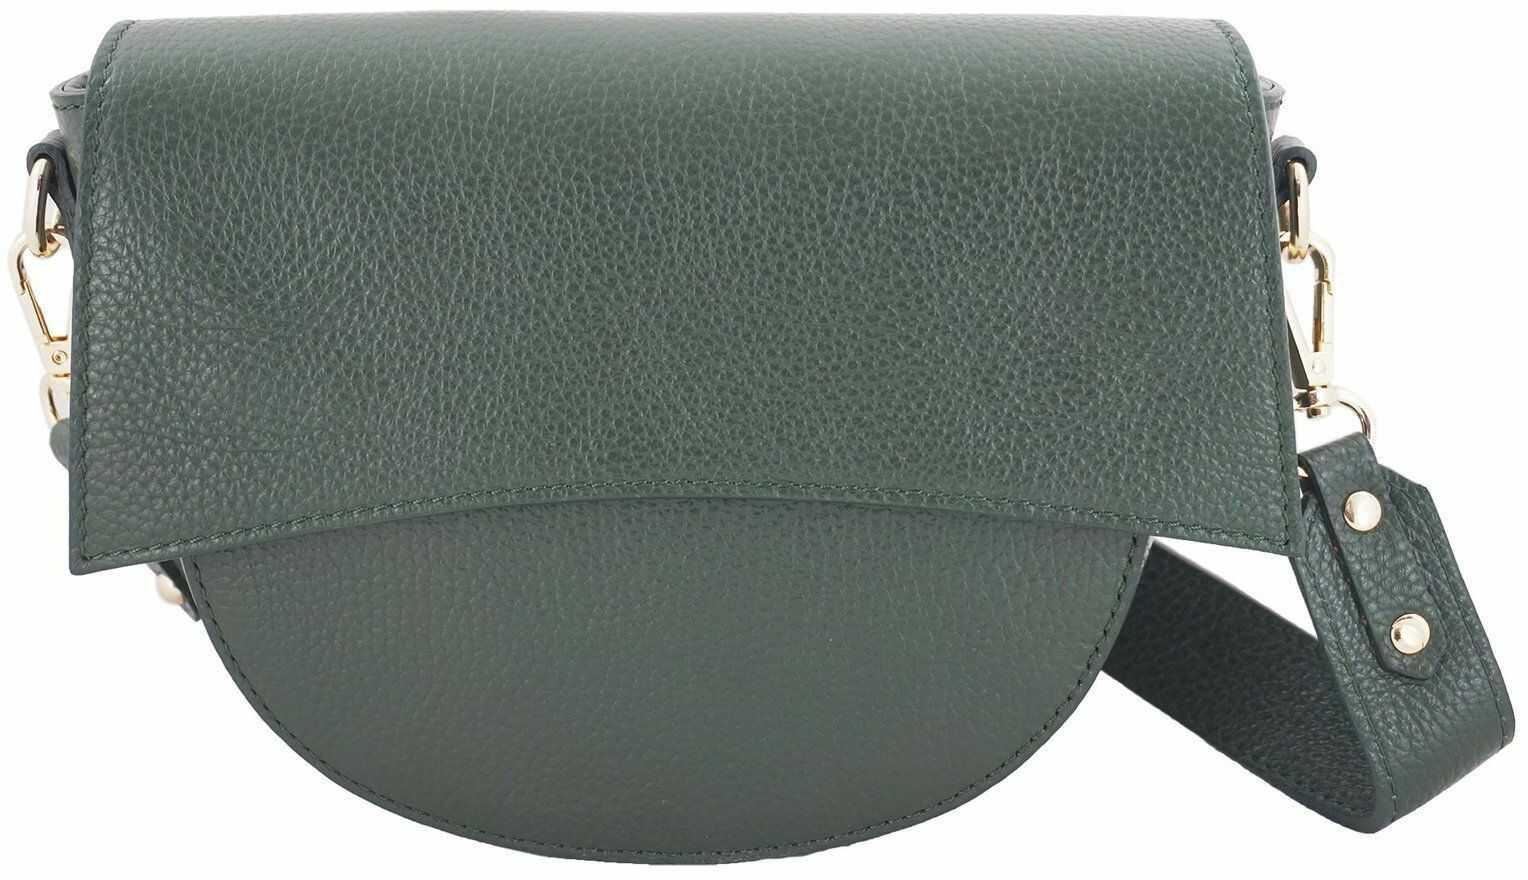 Skórzana torebka listonoszka damska - Zielona ciemna